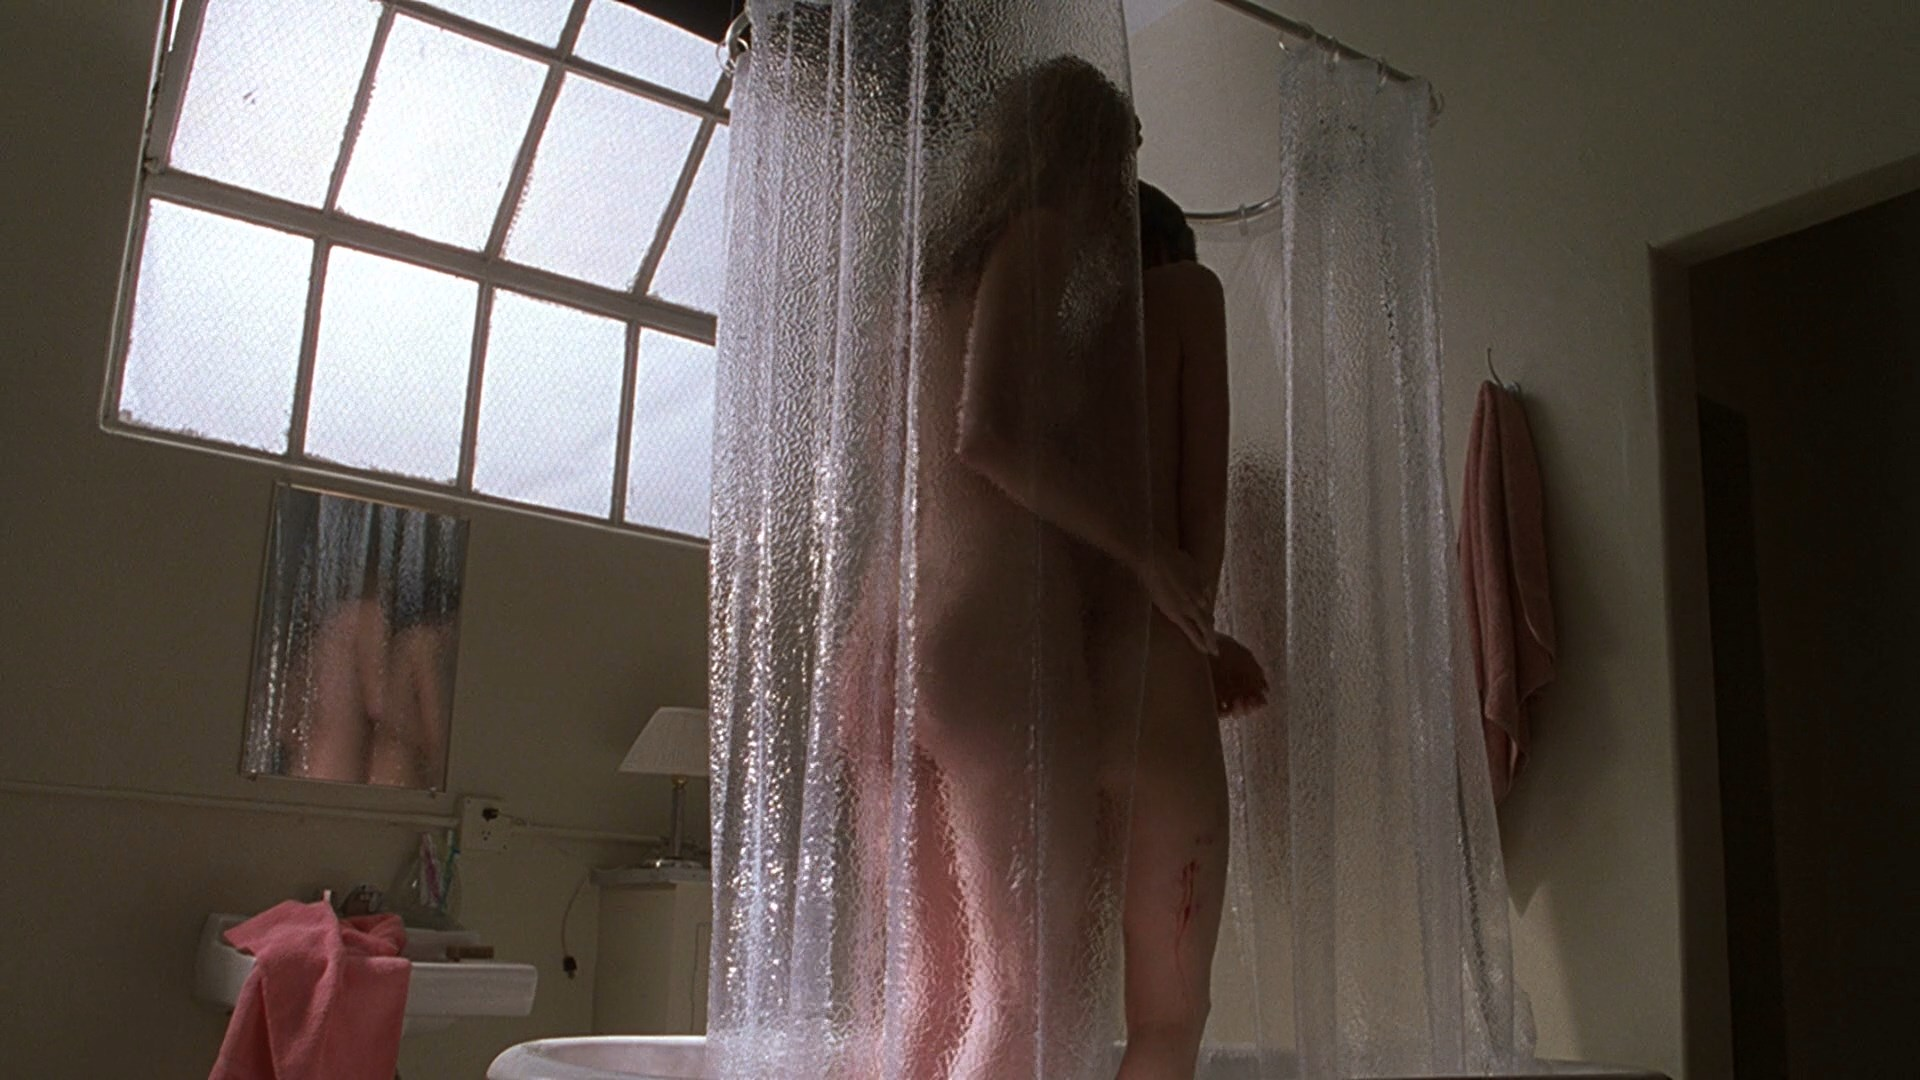 Angelina jolie gia nude photoshoot - 1 part 10